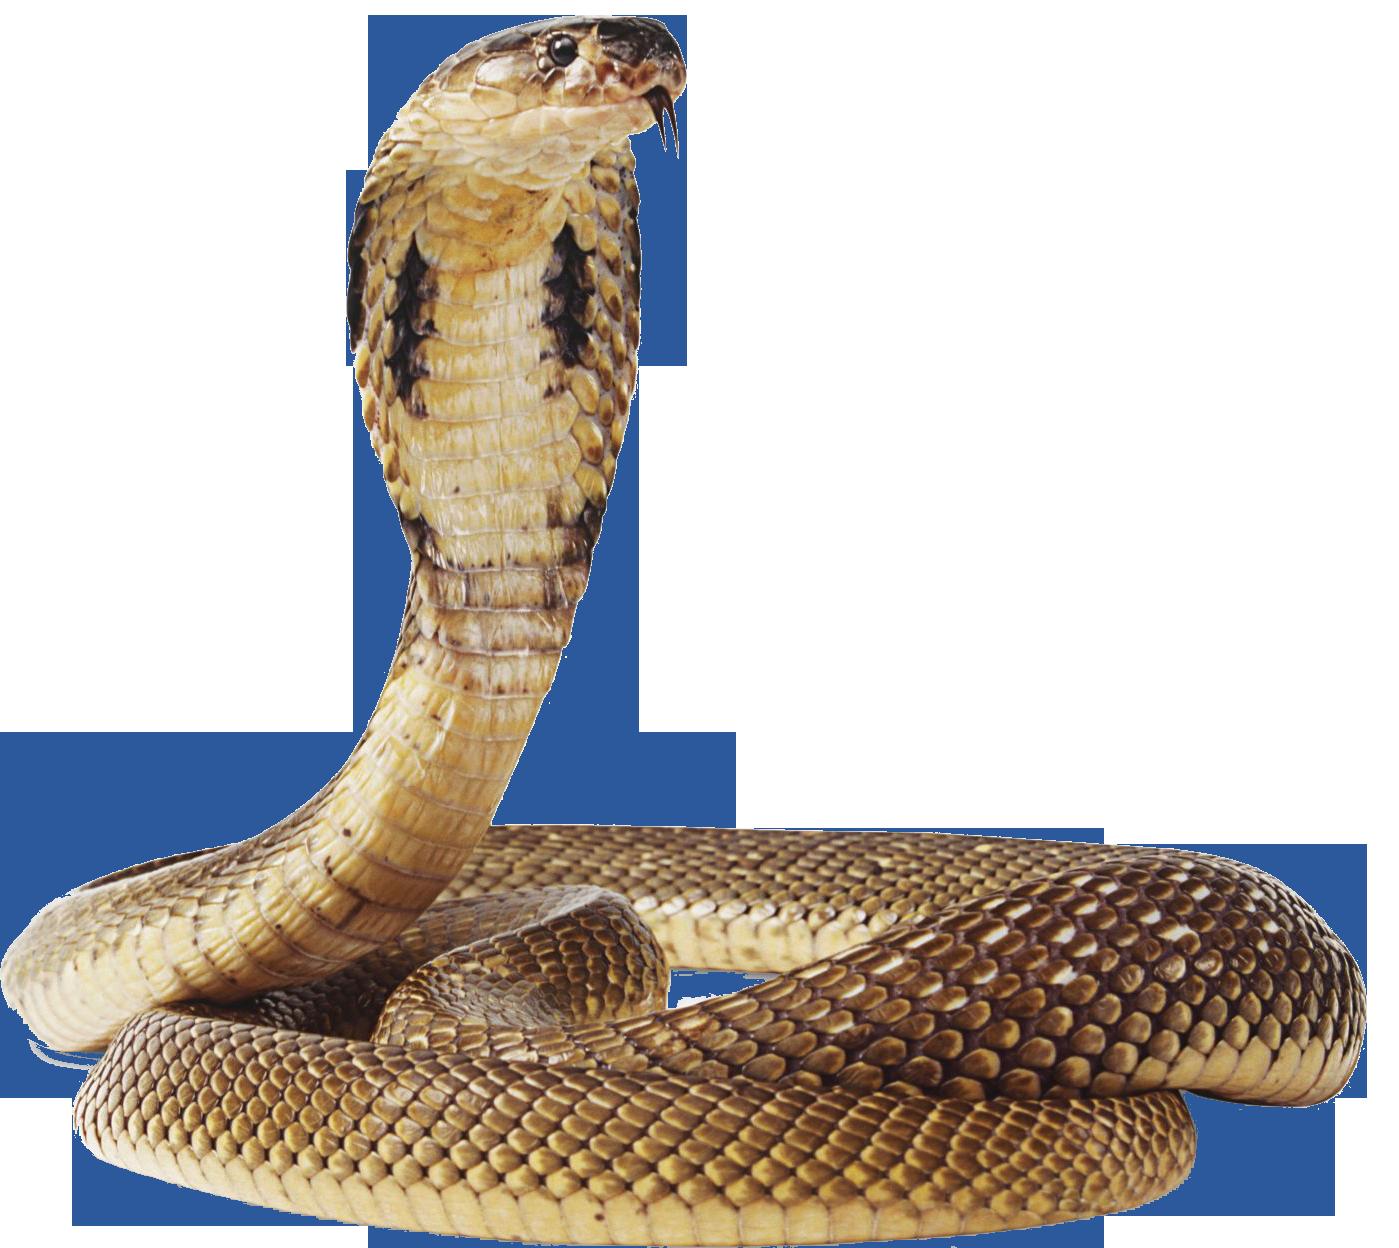 Snake PNG - 1061